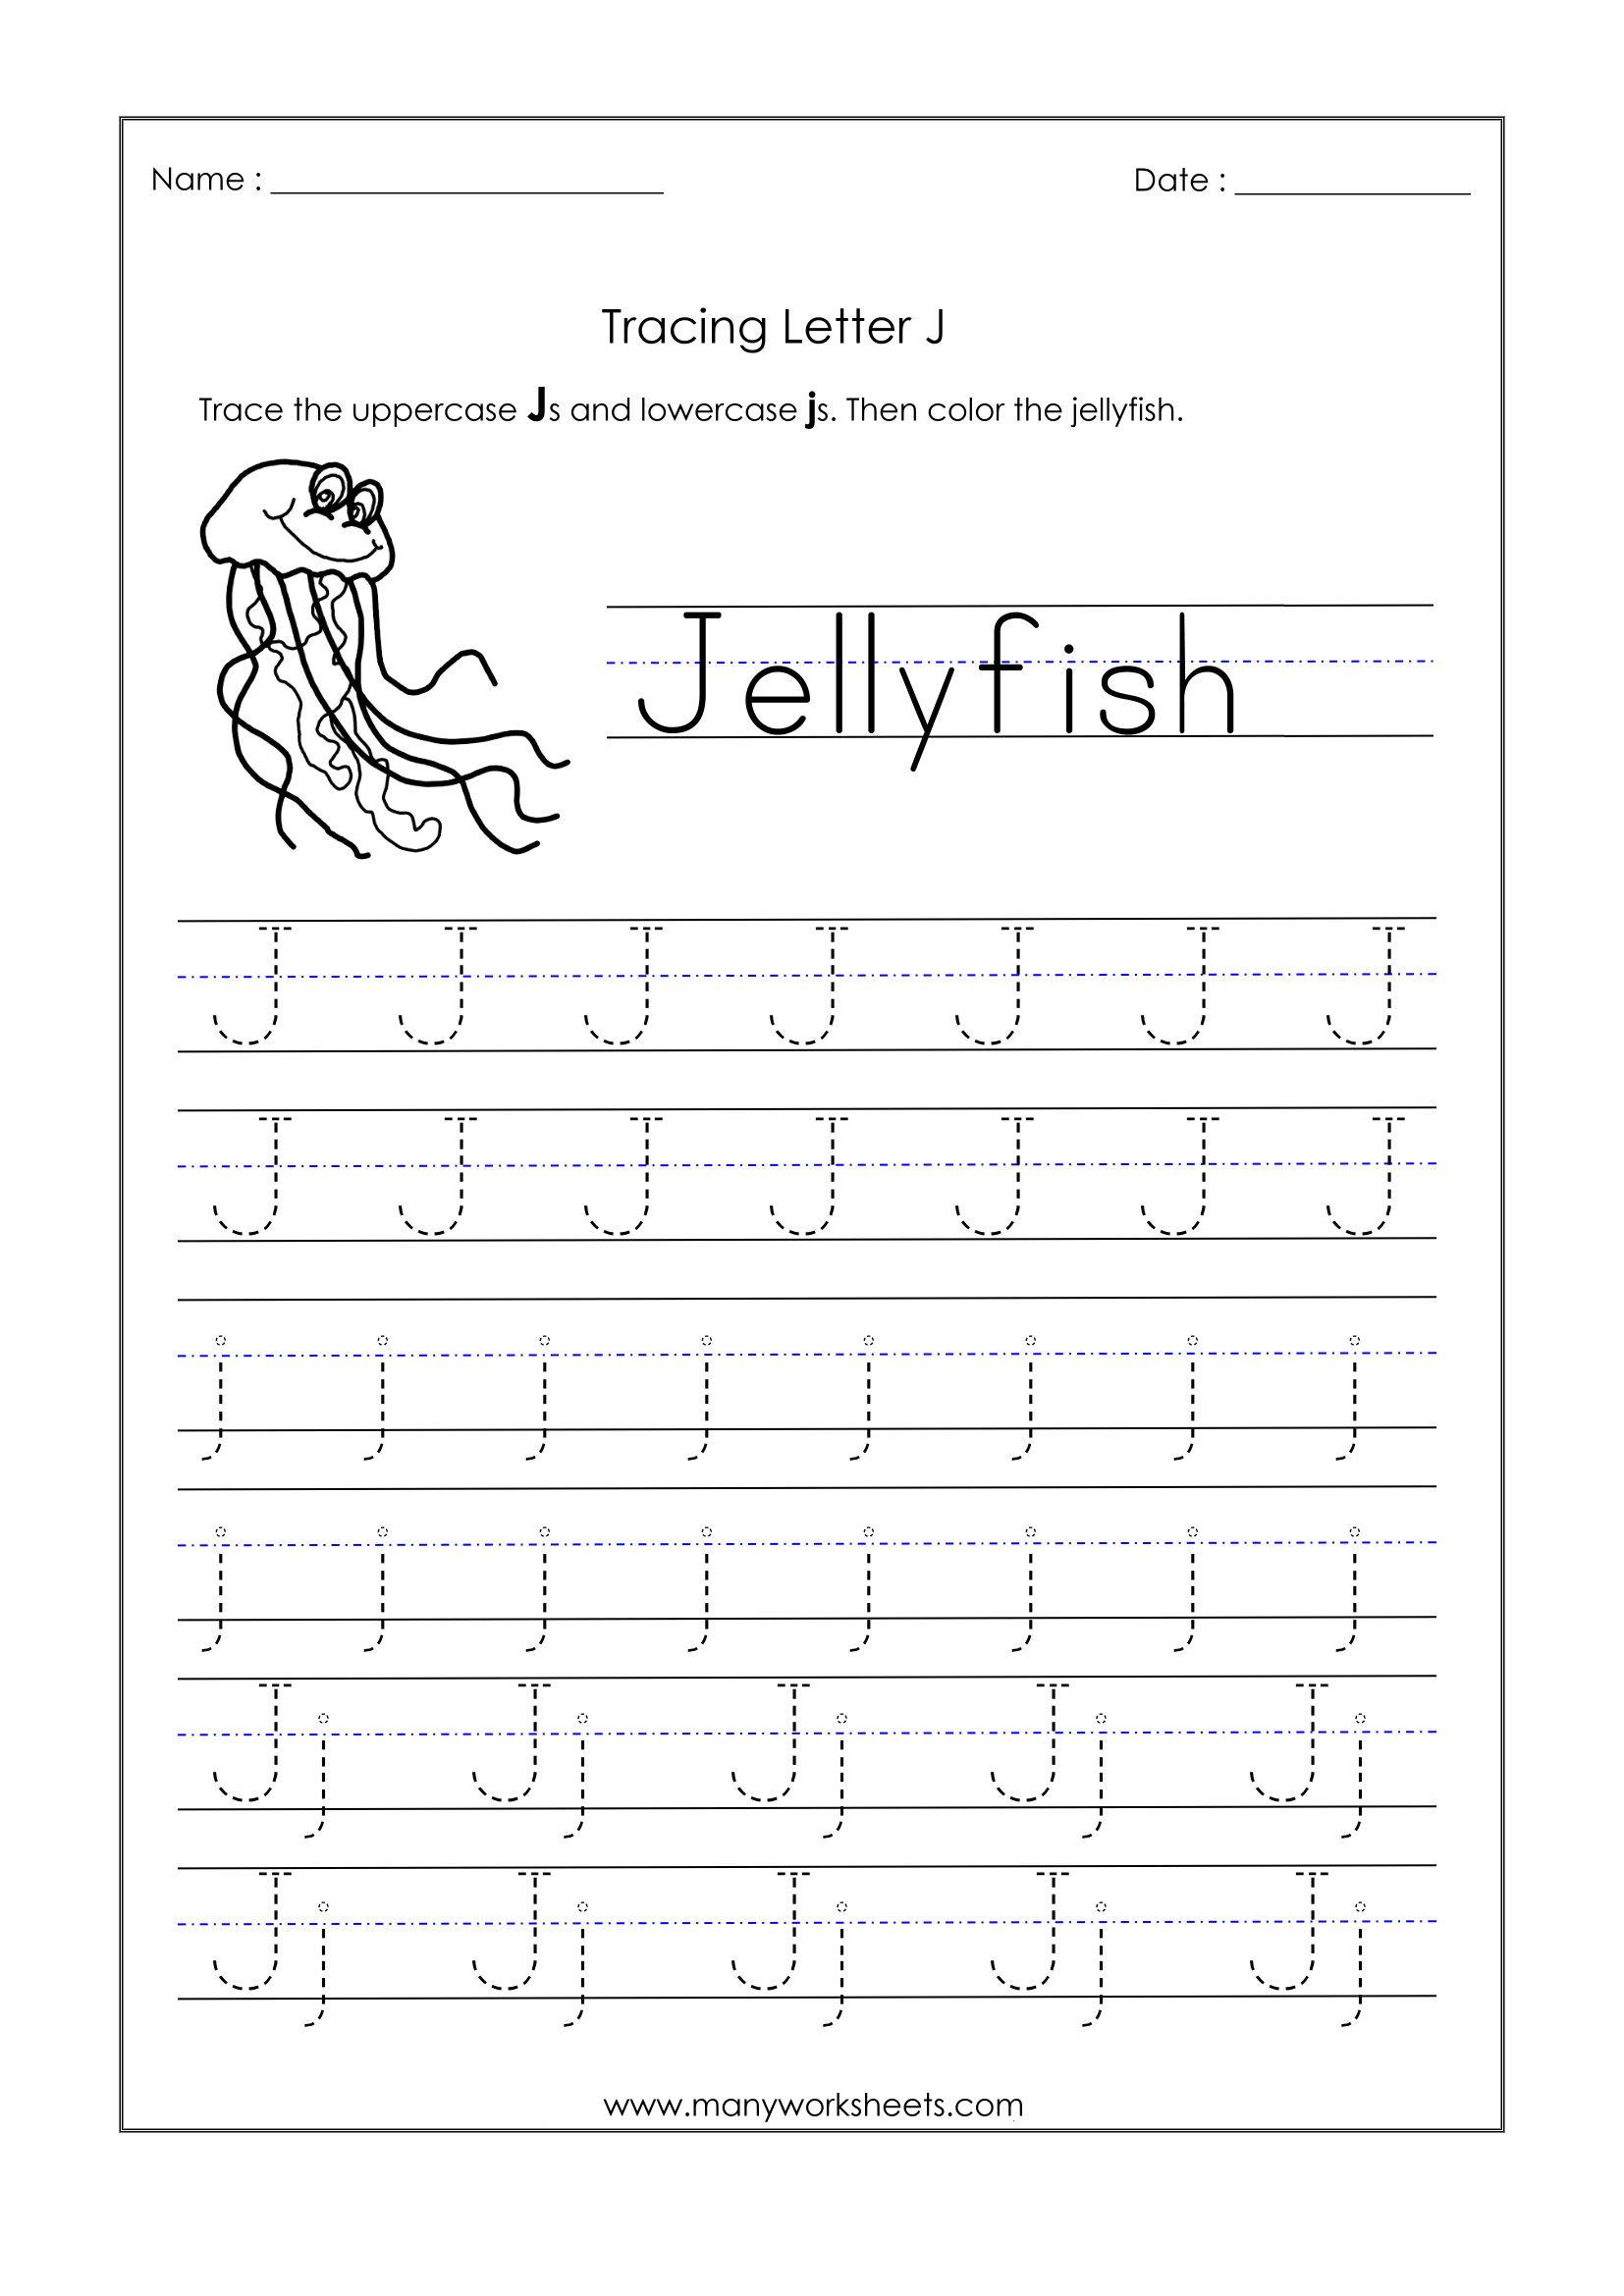 Free Printable Letter J Tracing Worksheets Dot To Dot